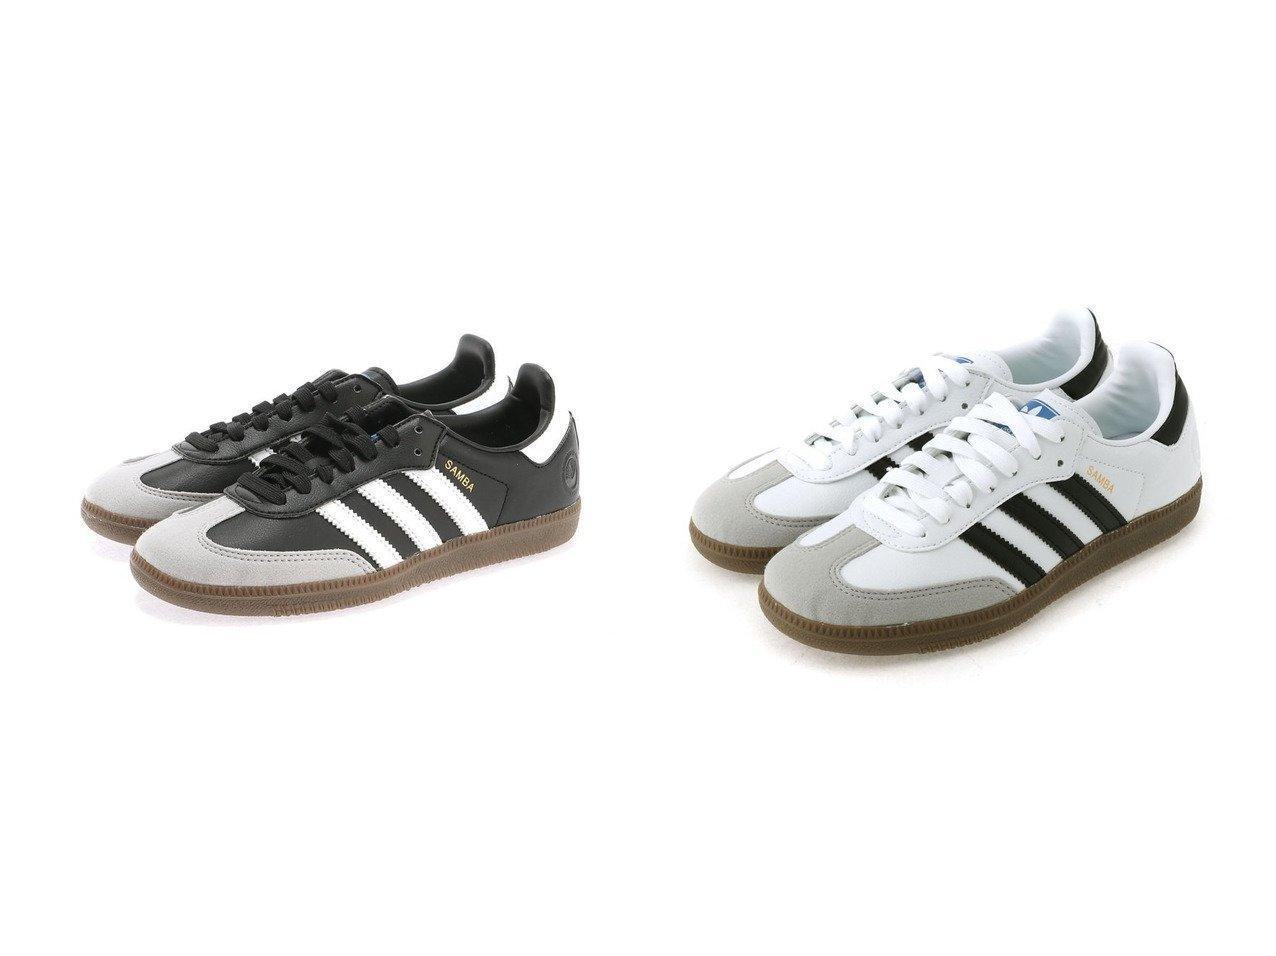 【adidas Originals/アディダス オリジナルス】のサンバ ヴィーガン SAMBA VEGAN アディダスオリジナルス adidasのおすすめ!人気、トレンド・レディースファッションの通販  おすすめで人気の流行・トレンド、ファッションの通販商品 メンズファッション・キッズファッション・インテリア・家具・レディースファッション・服の通販 founy(ファニー) https://founy.com/ ファッション Fashion レディースファッション WOMEN コーティング サッカー シューズ スニーカー スリッポン ライニング 再入荷 Restock/Back in Stock/Re Arrival |ID:crp329100000020208